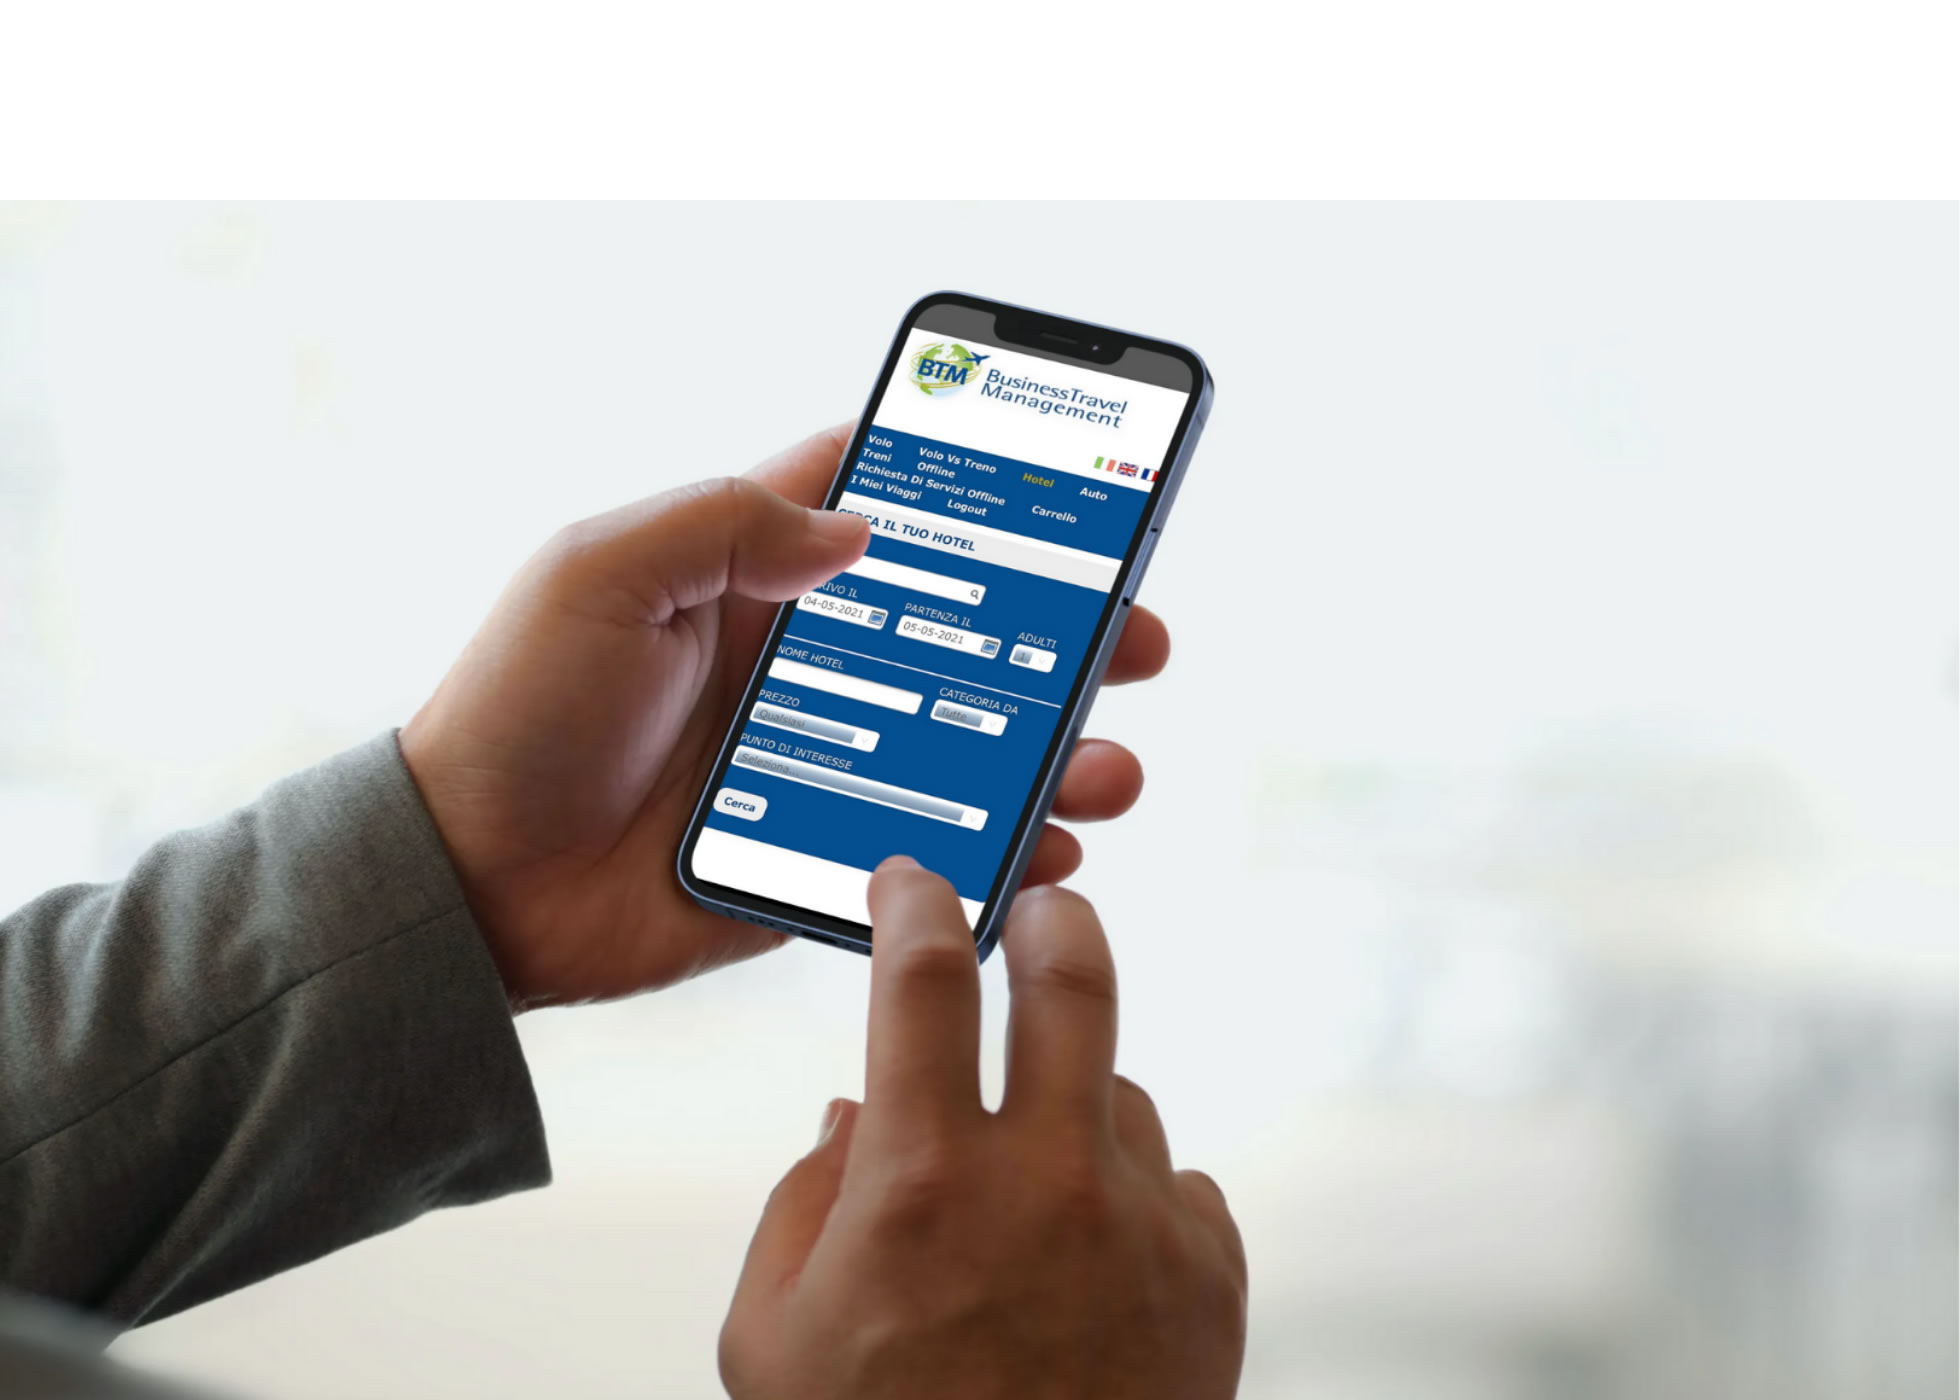 http://www.business-travel-btm.com/wp-content/uploads/2021/05/Self-Booking-Tool-smartphone-BTM-Business-Travel-Management.jpg